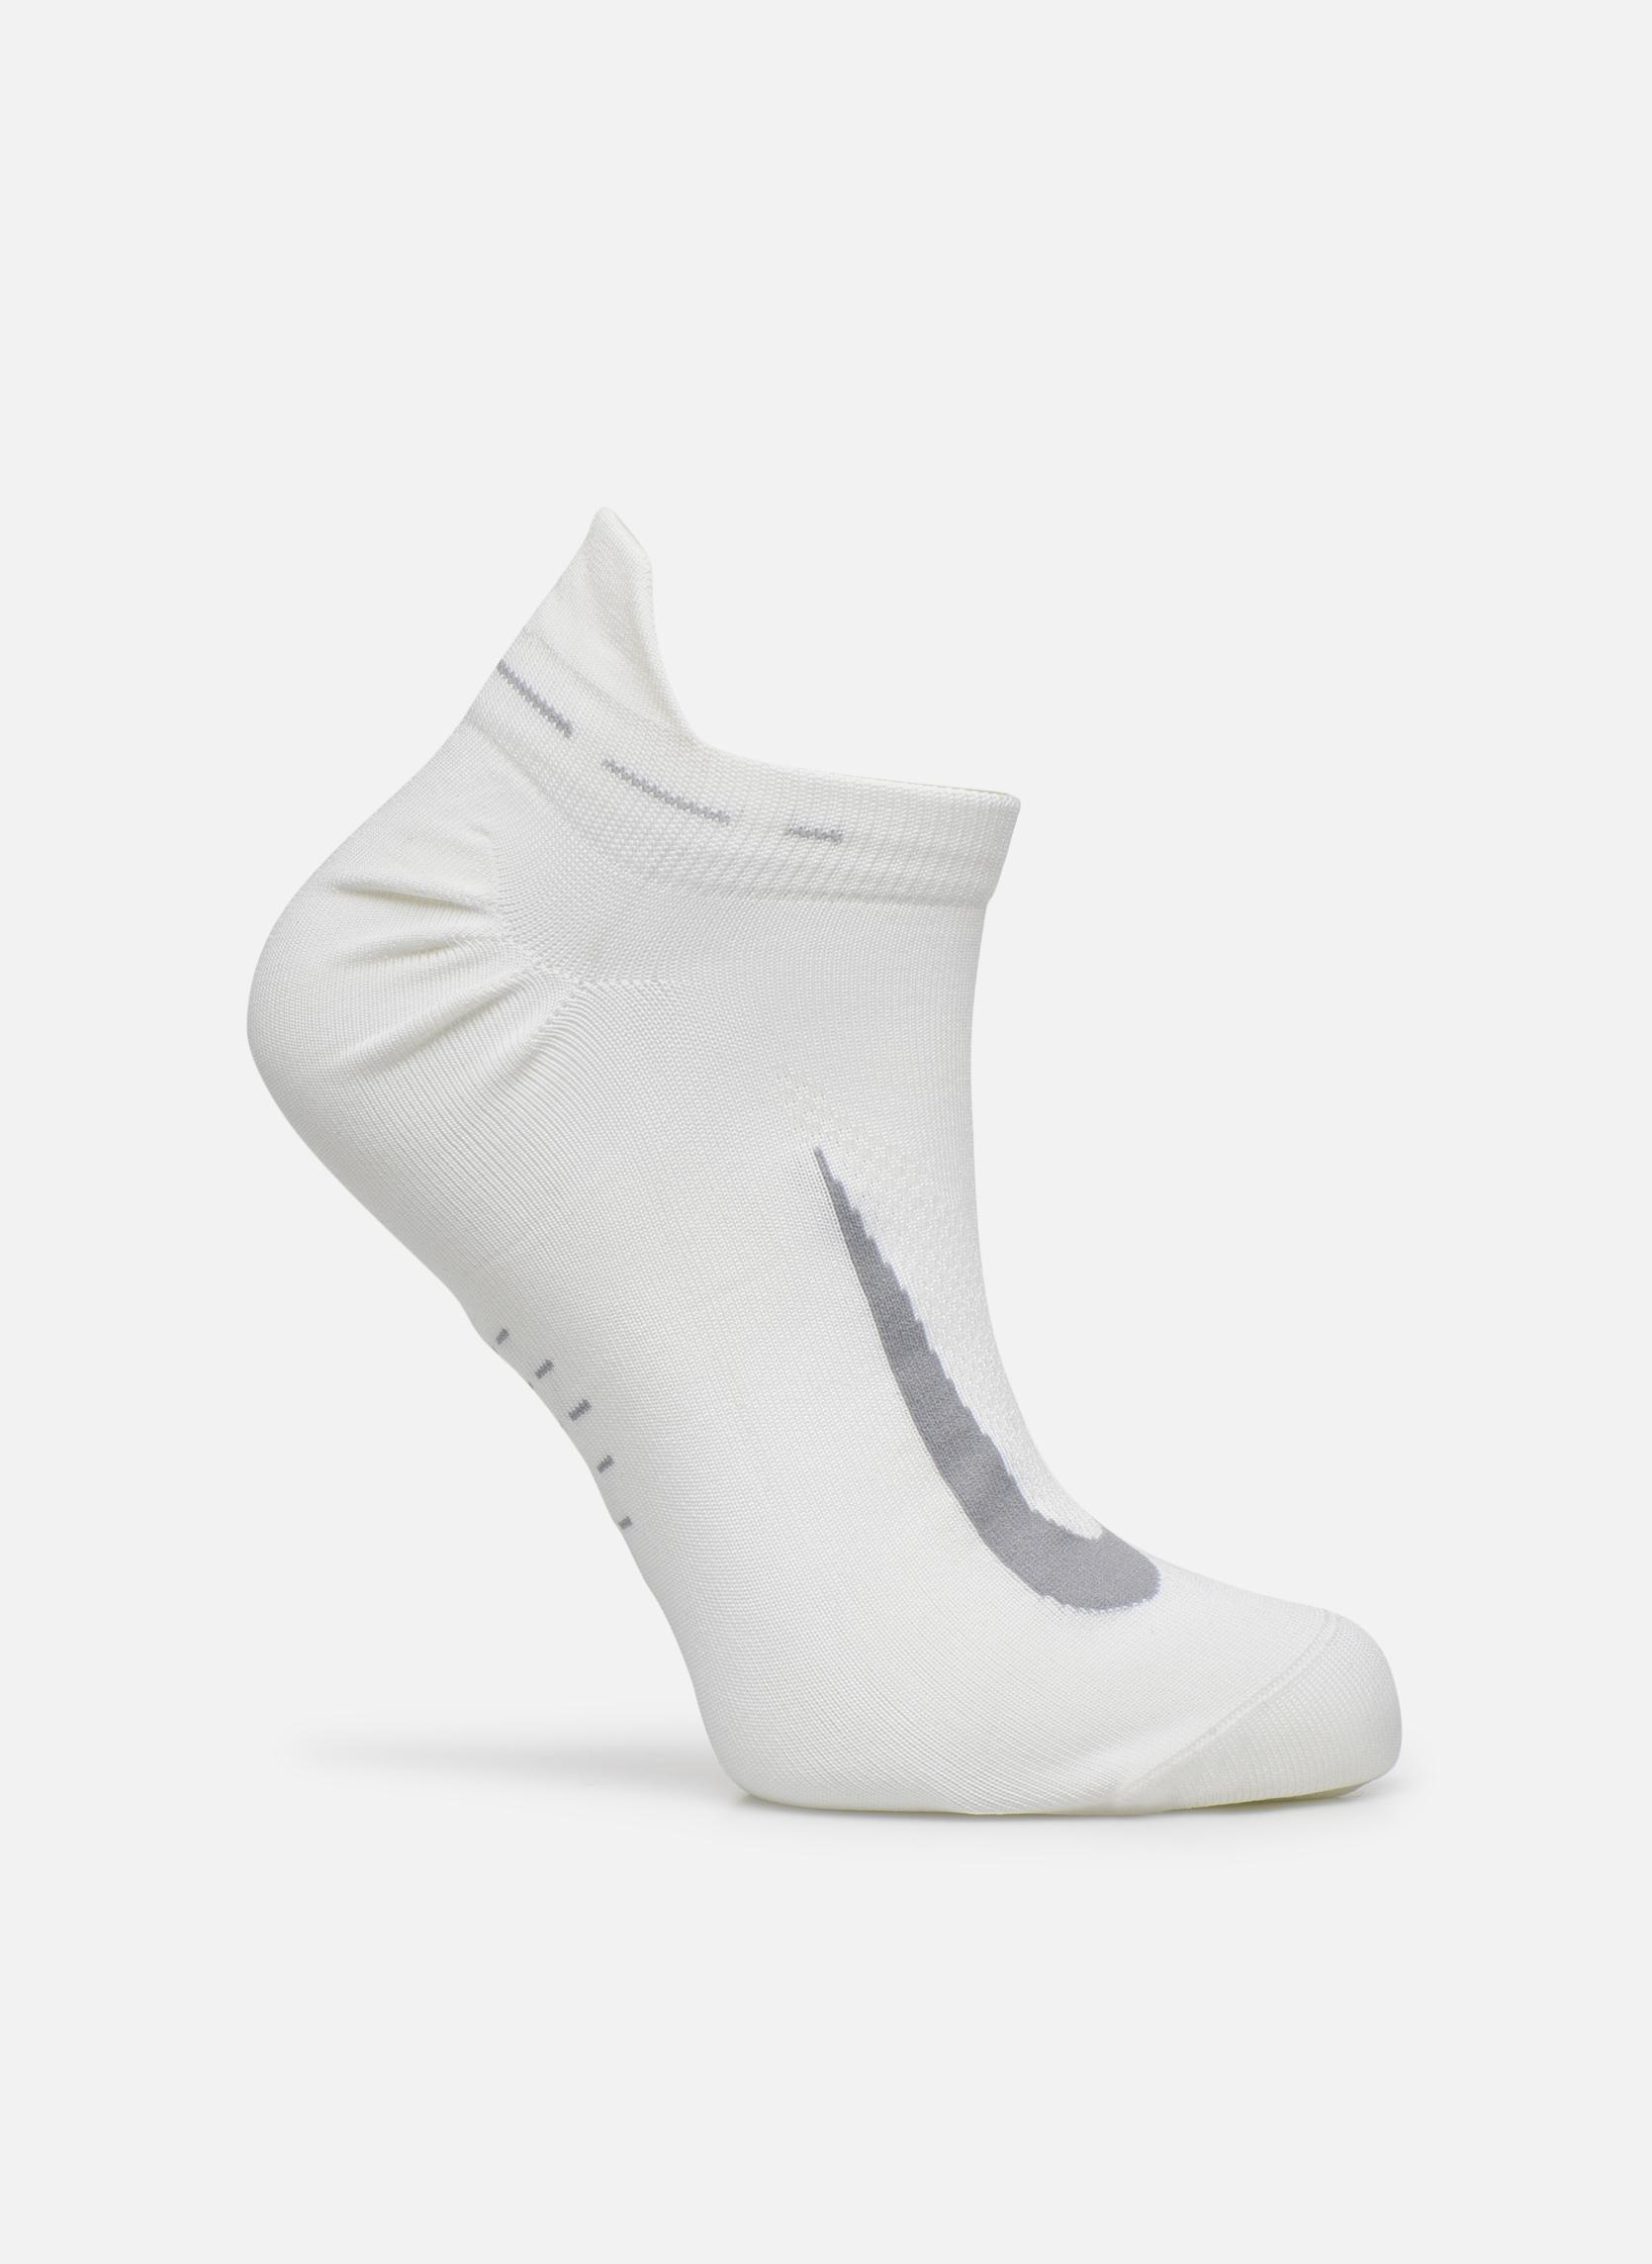 Medias y Calcetines Nike Nike Elite Lightweight No-Show Tab Running Sock Blanco vista de detalle / par